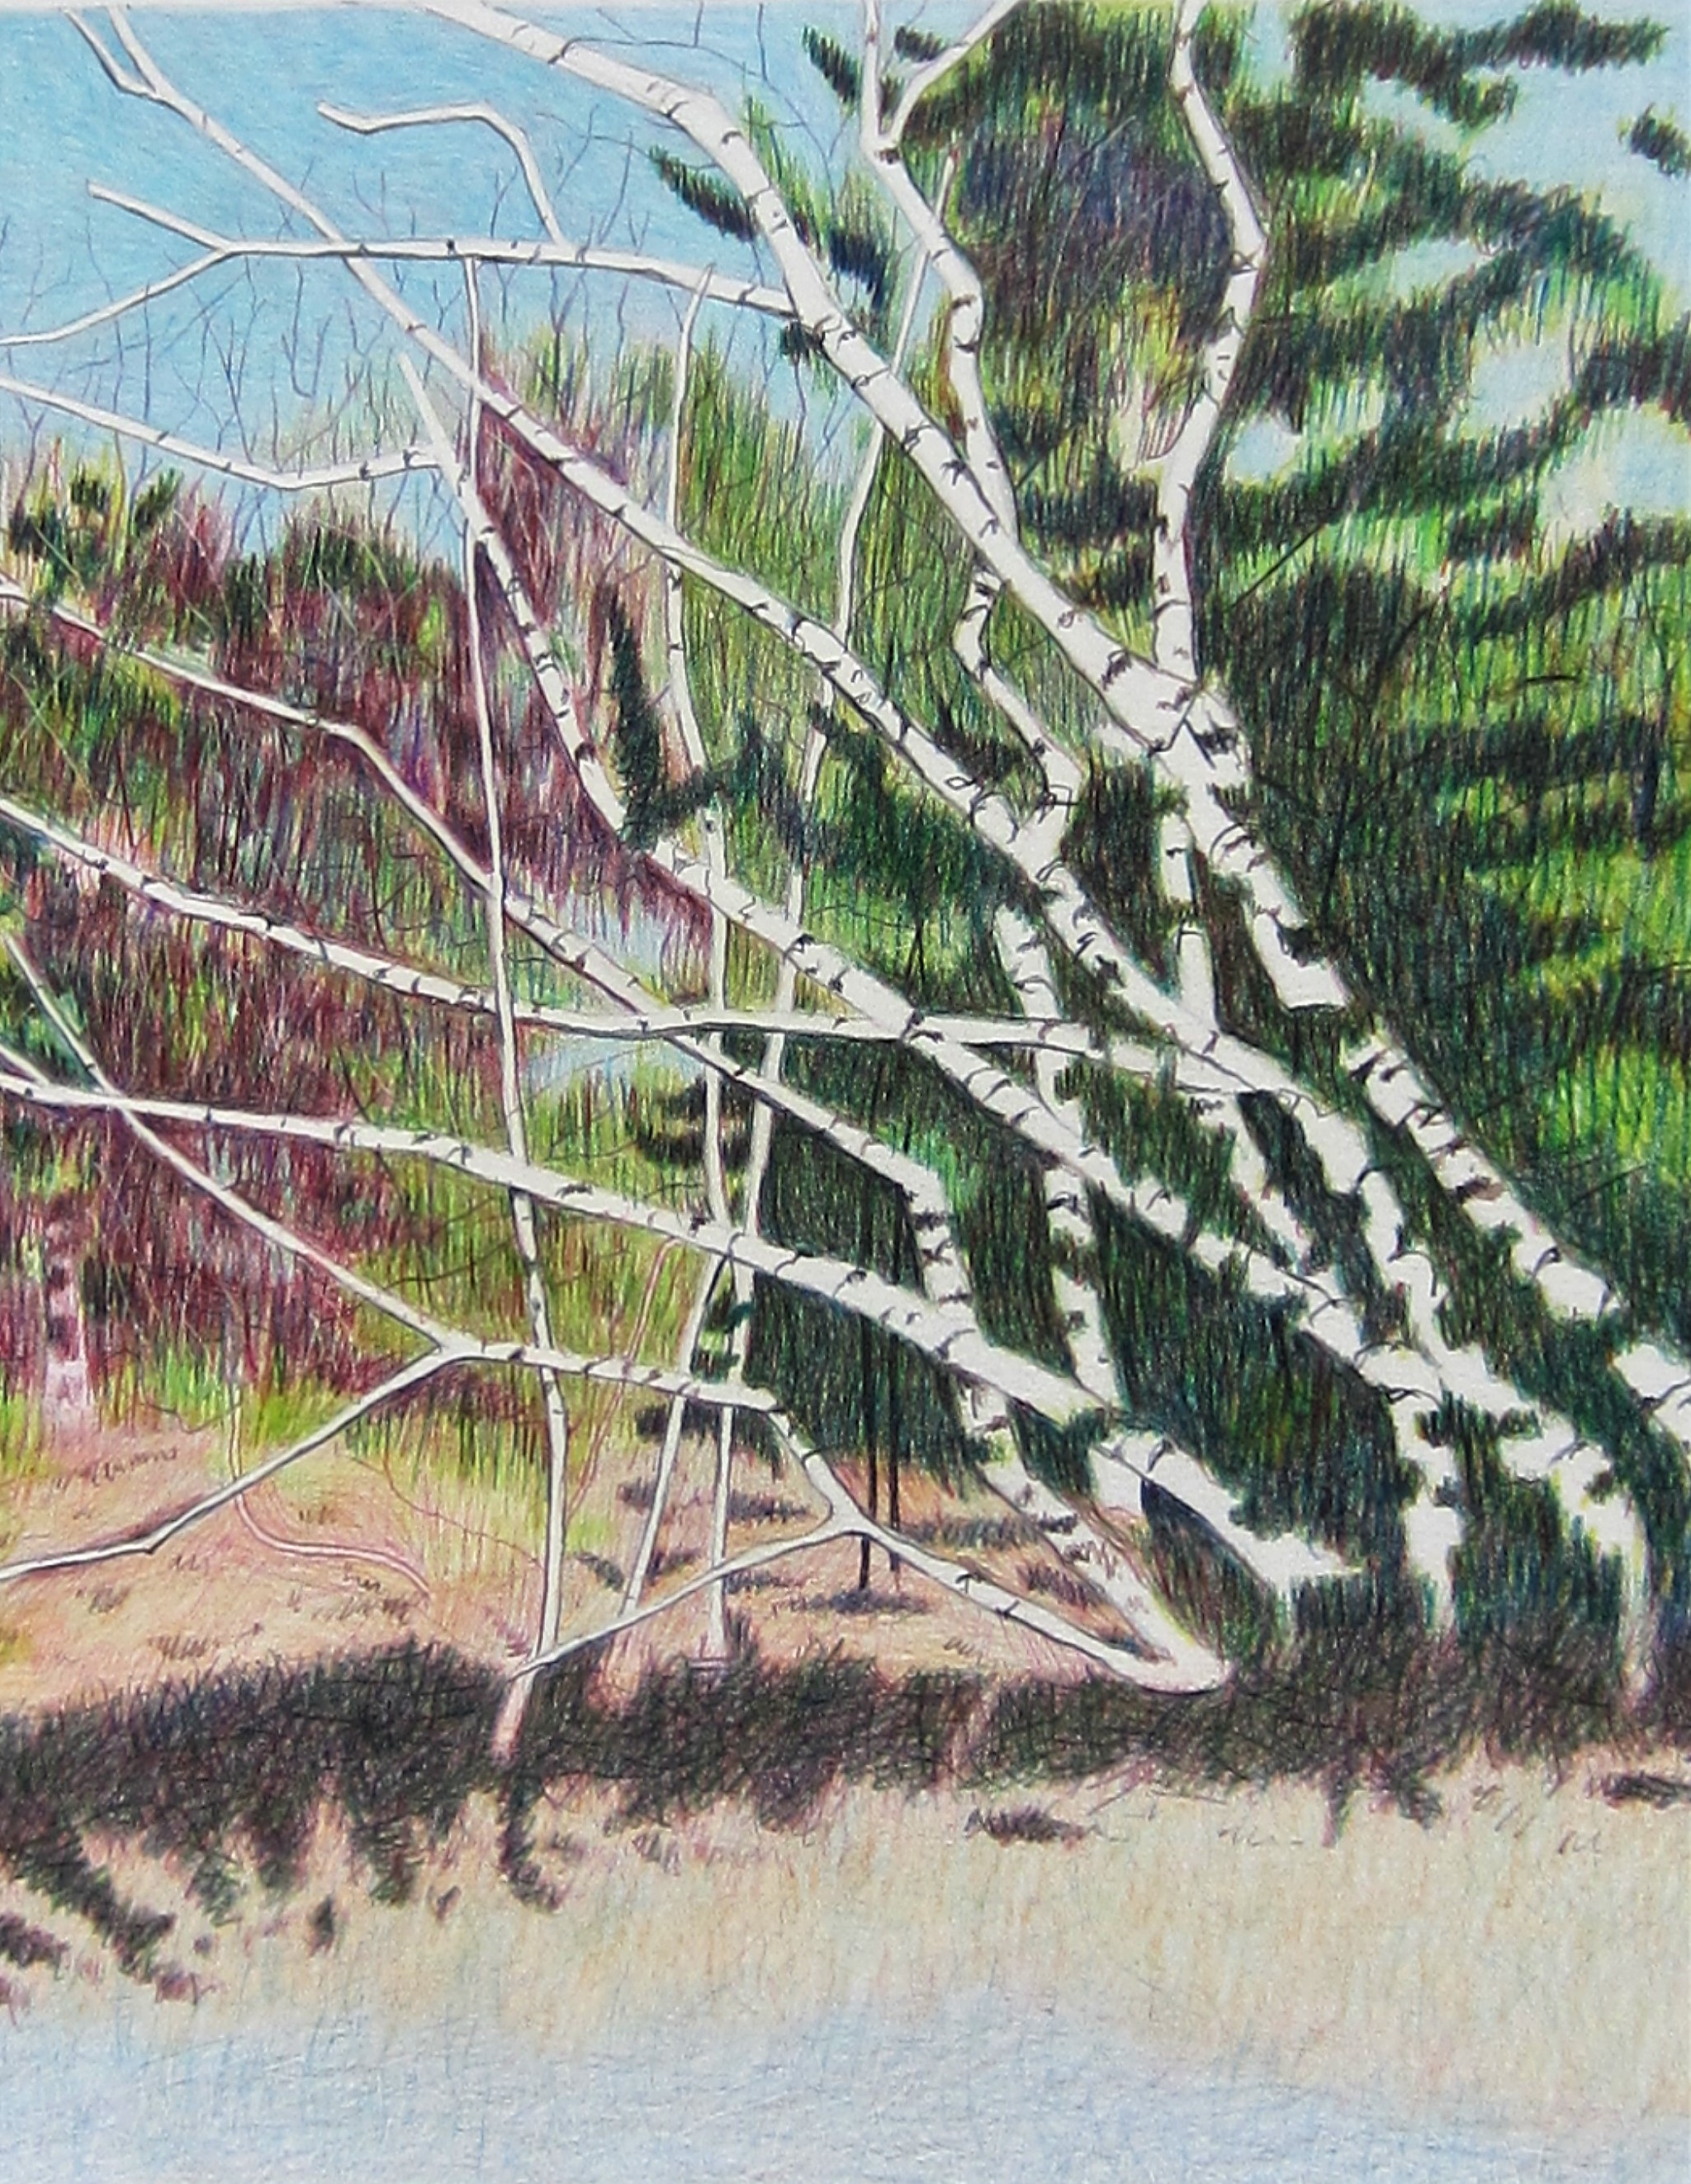 NORTH CAROLINA BIRCH TREES